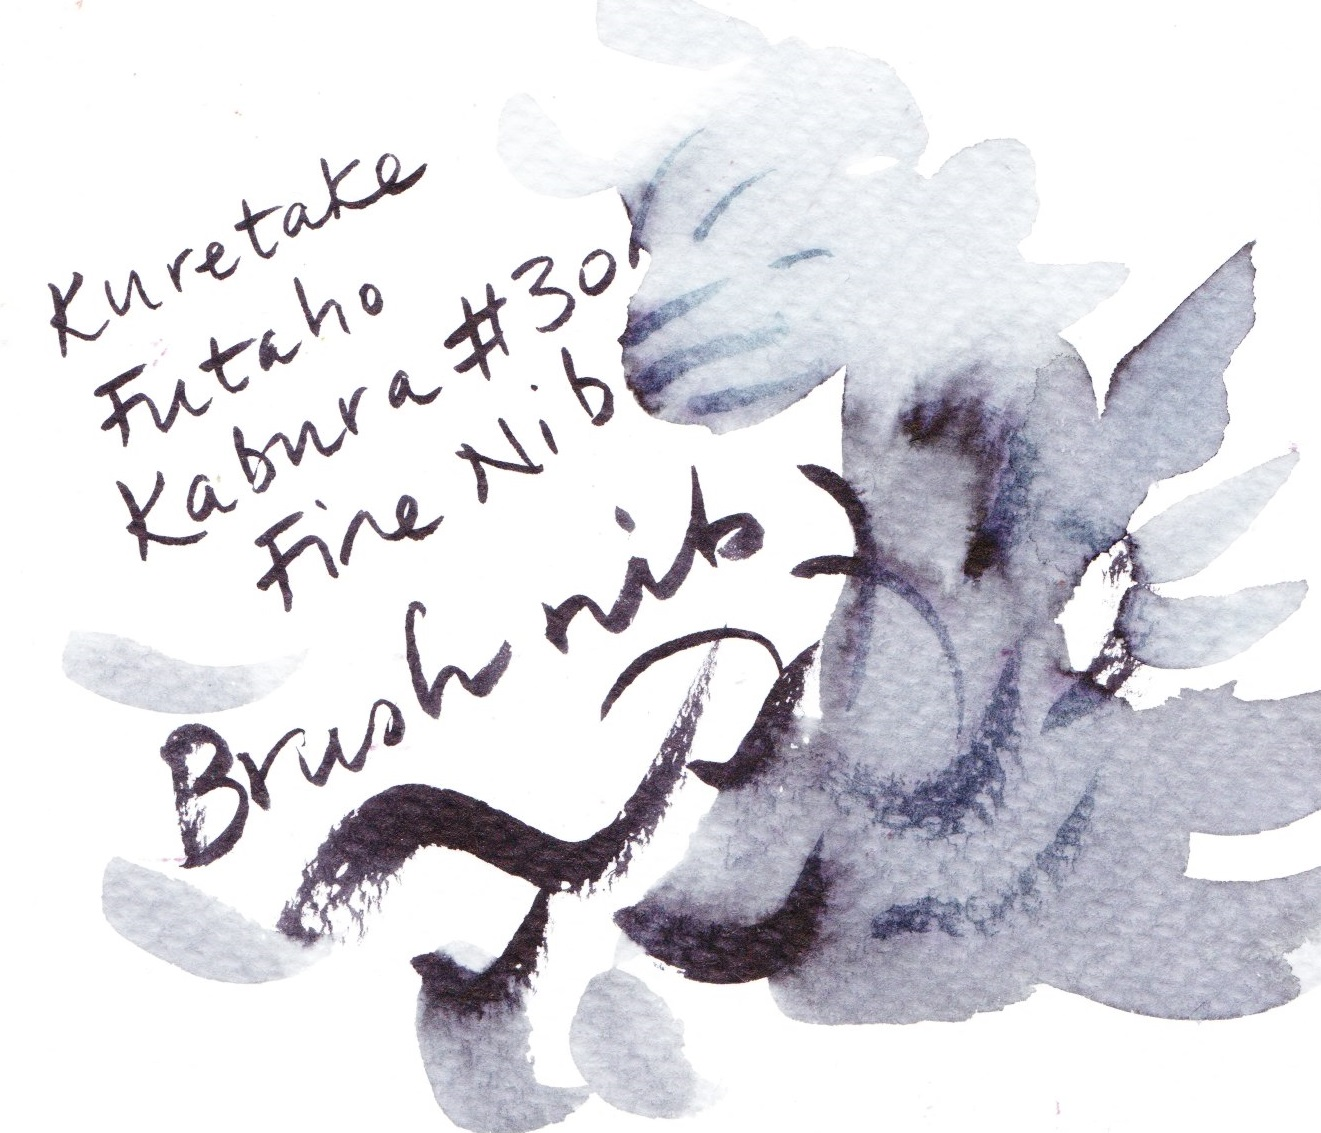 Kuretake Futaho Kabura 'No.30' Fude Pen diluted on cold pressed paper